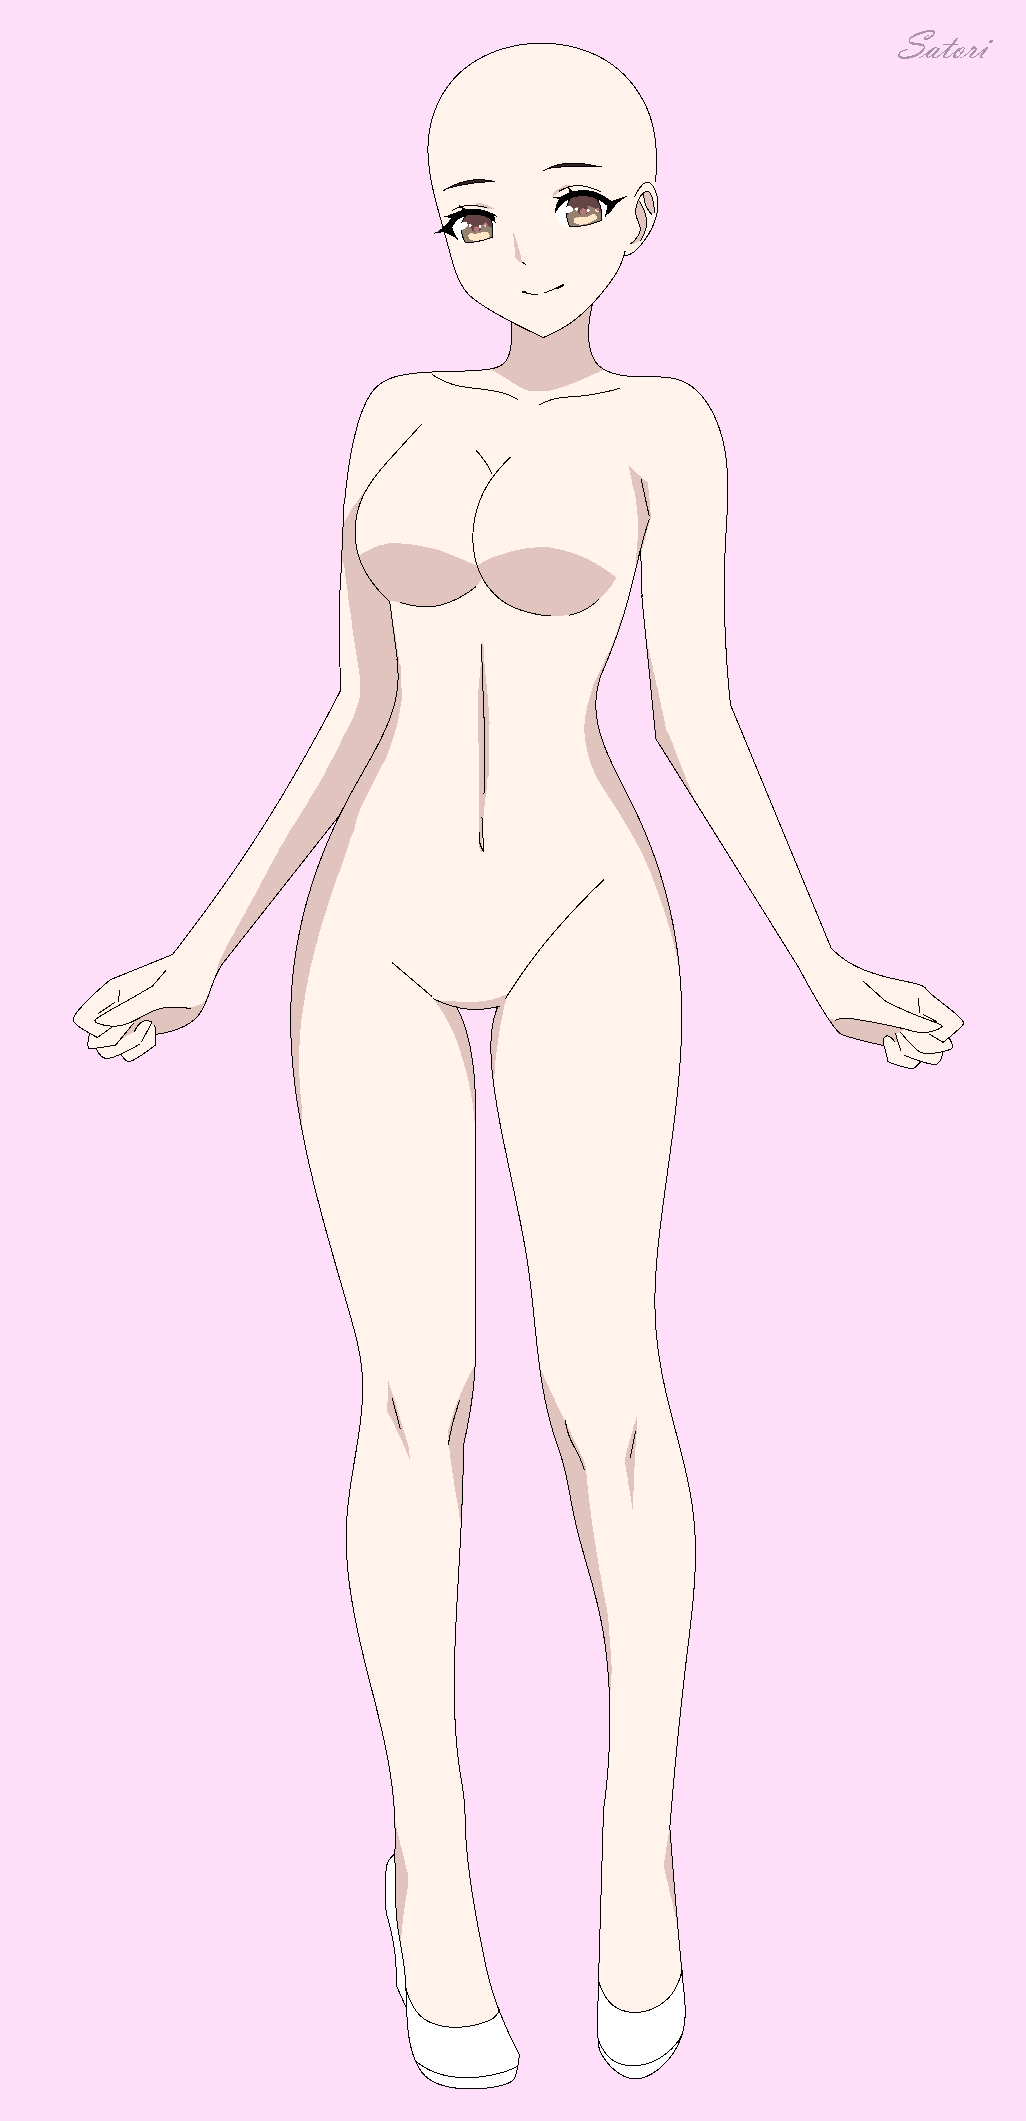 anime girl reference fullbody base by SatoriSky on DeviantArt